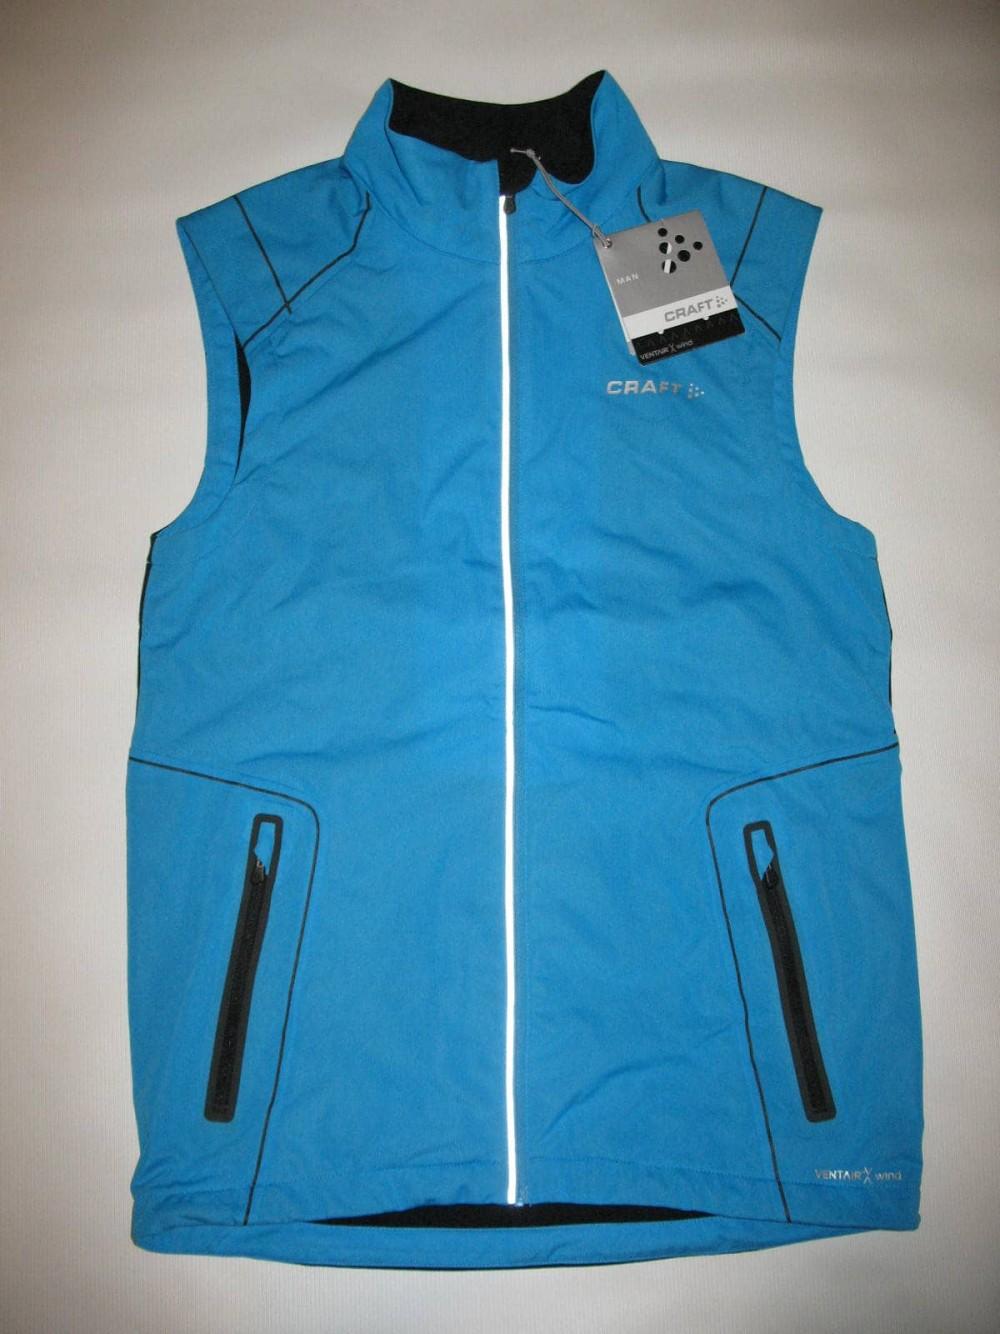 Жилет CRAFT pxc high function softshell vest (размер XS/S) - 5